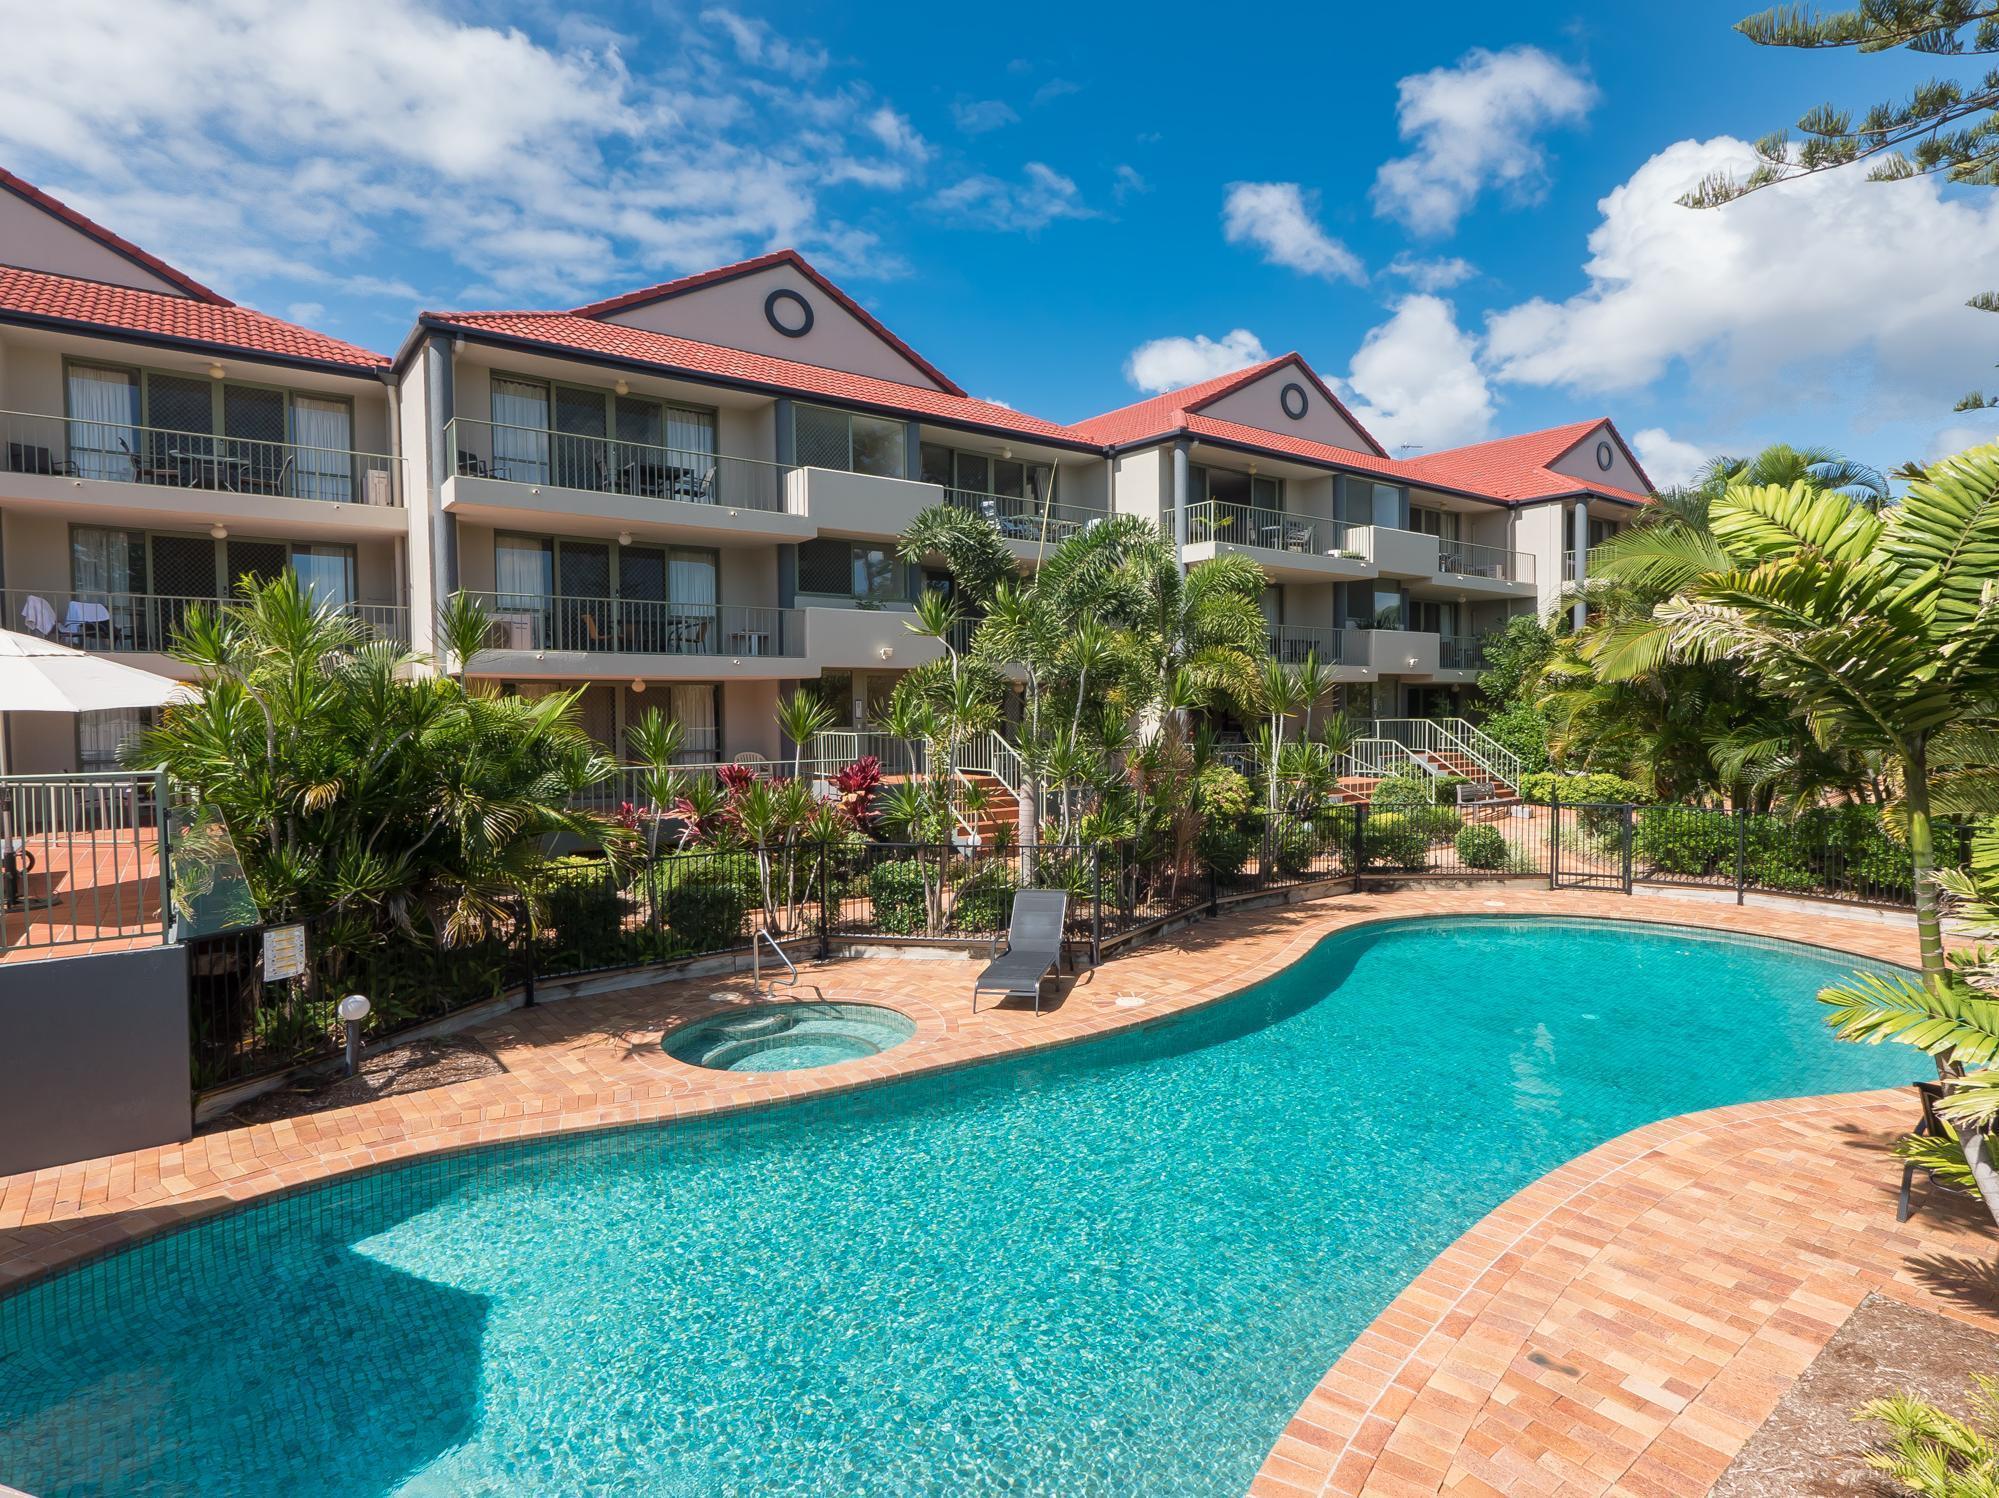 Montana Palms Holiday Apartments - Hotell och Boende i Australien , Guldkusten